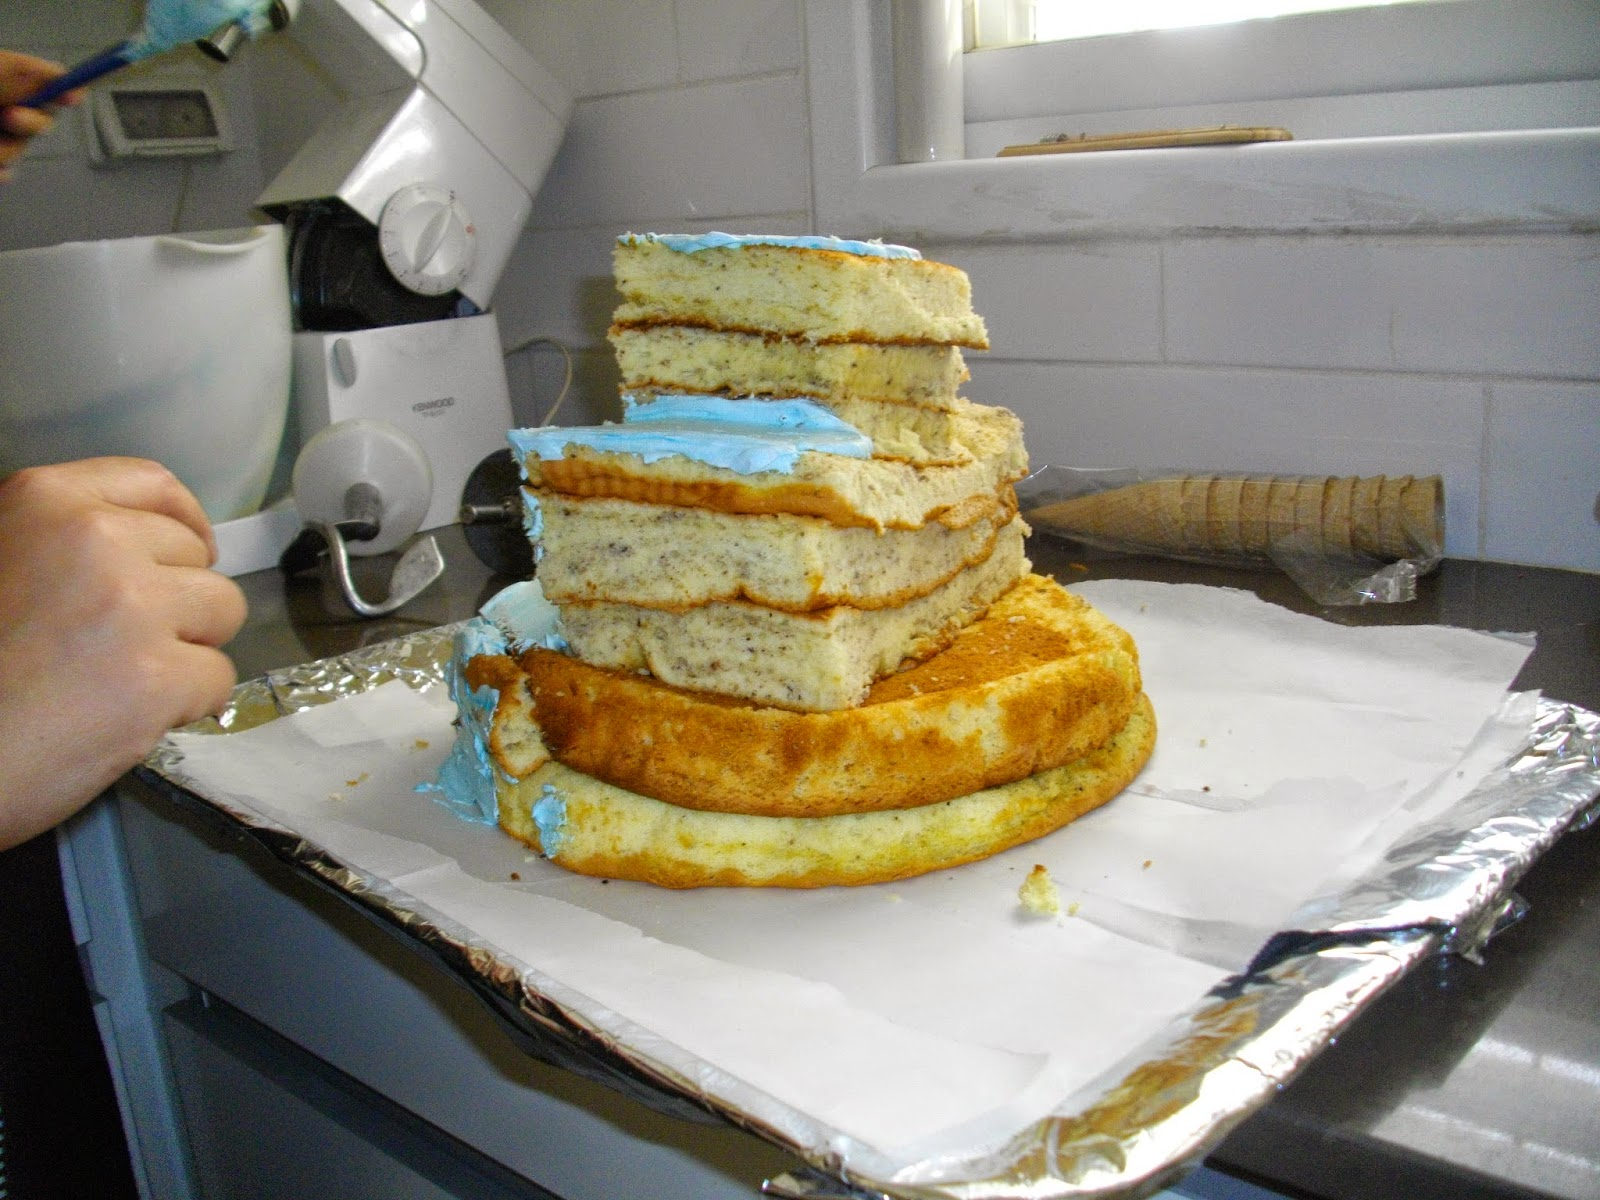 IMGP2859 - עוגת יומולדת בצורת ארמון